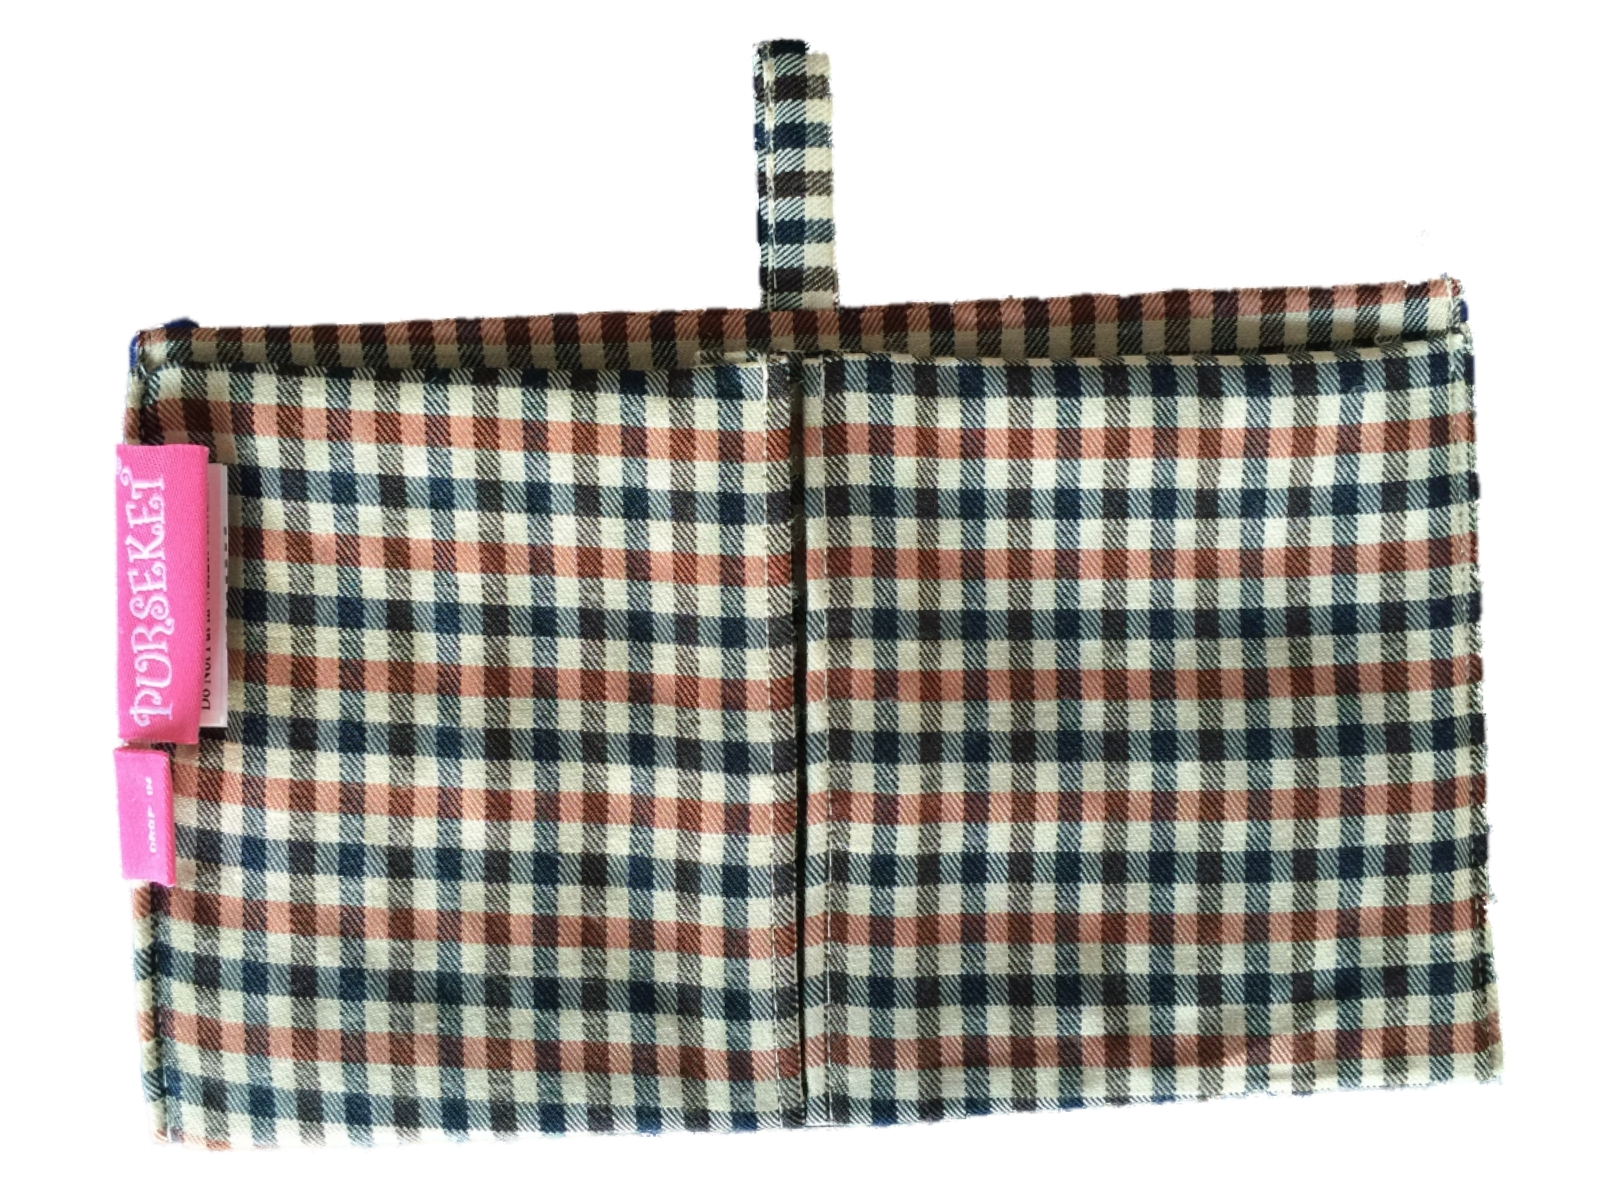 Purseket Mini Purse Organiser Insert with Gusseted Pockets Drop In Glen Check